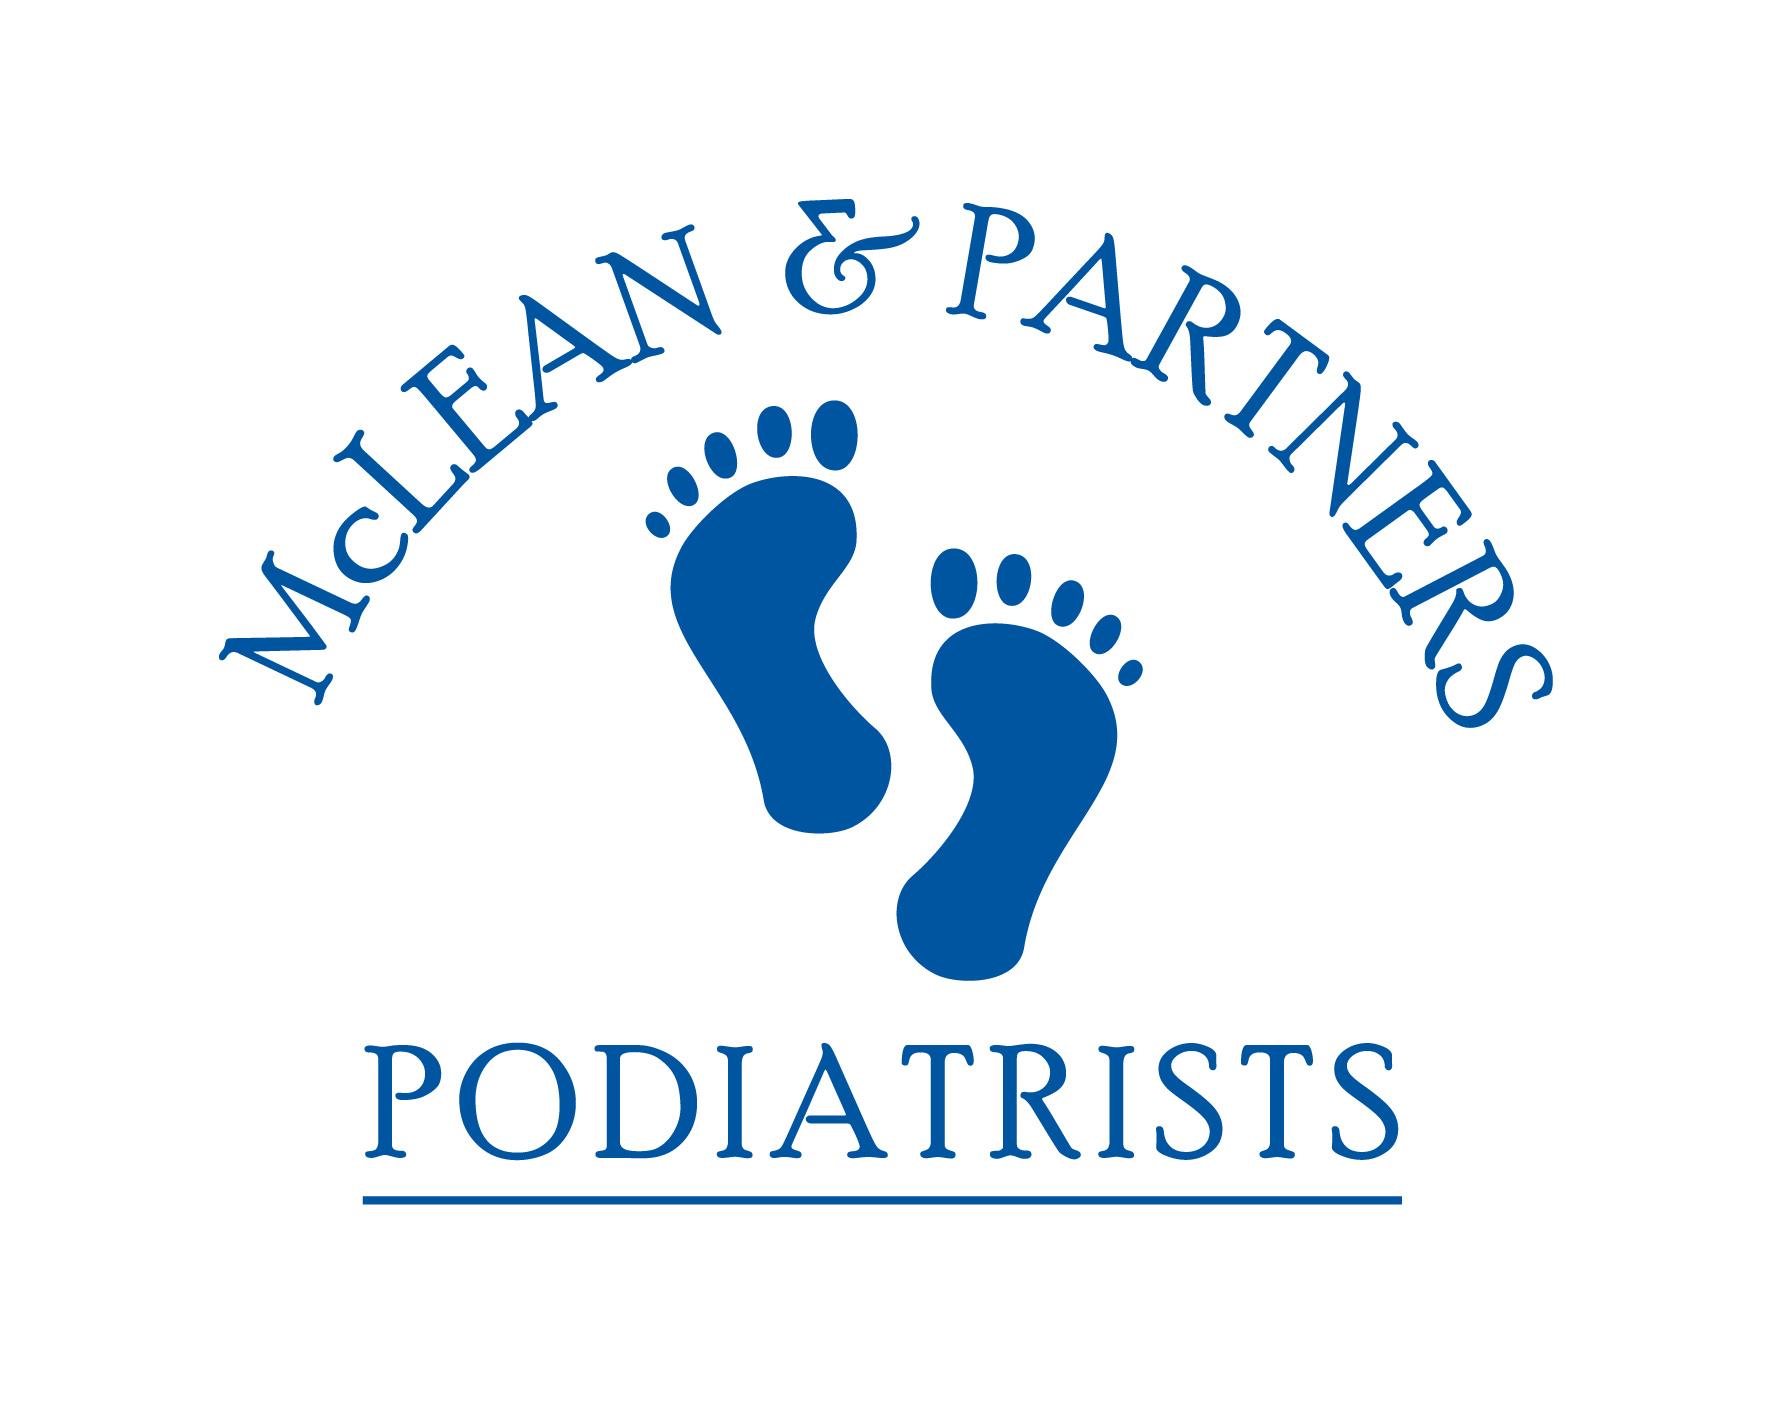 McLean & Partners Podiatrists